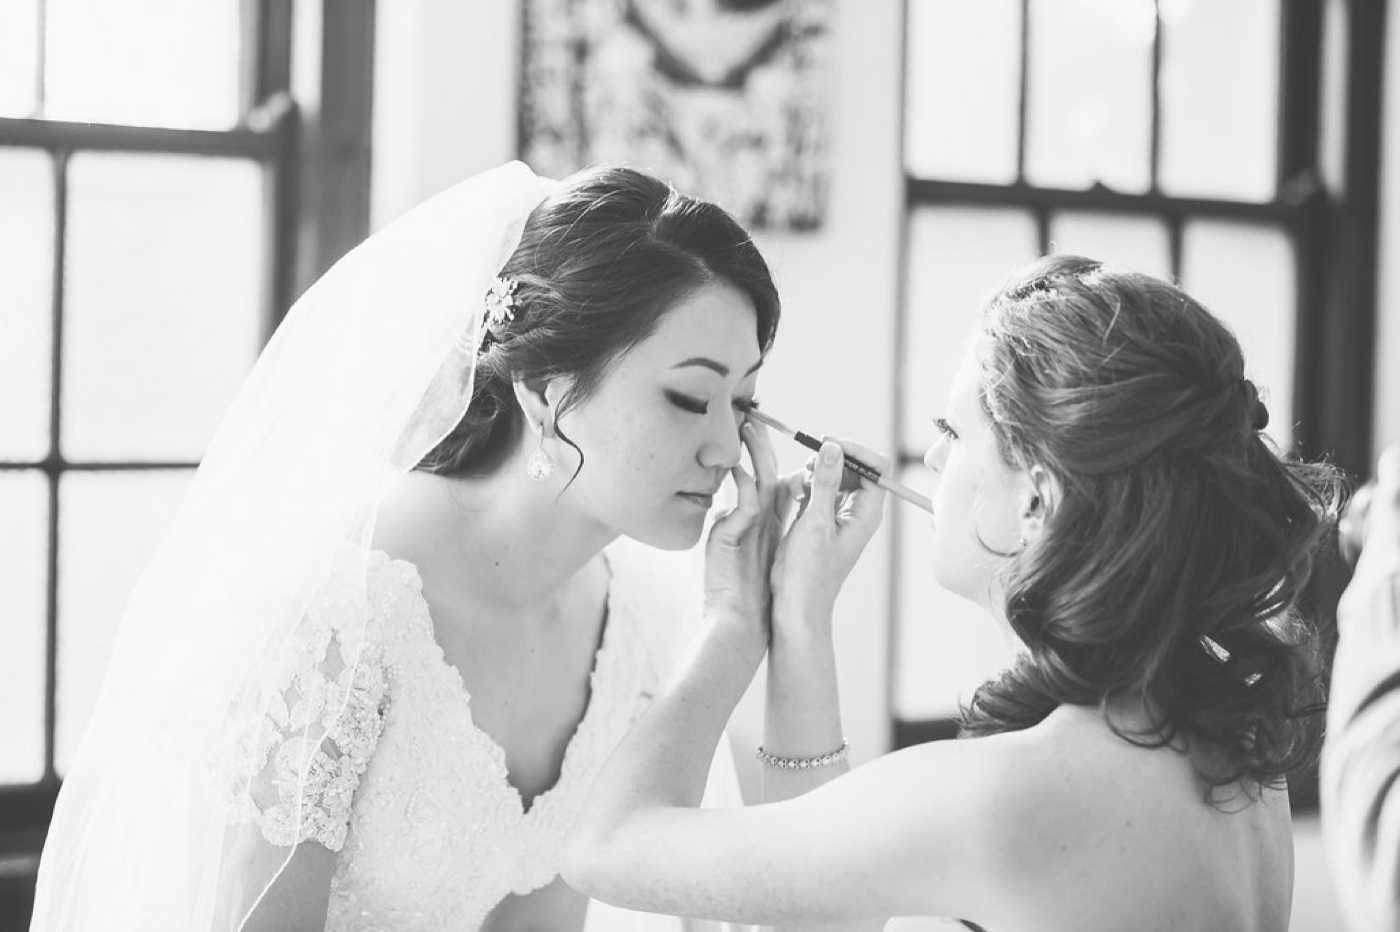 chicago-fine-art-wedding-photography-bolotin19